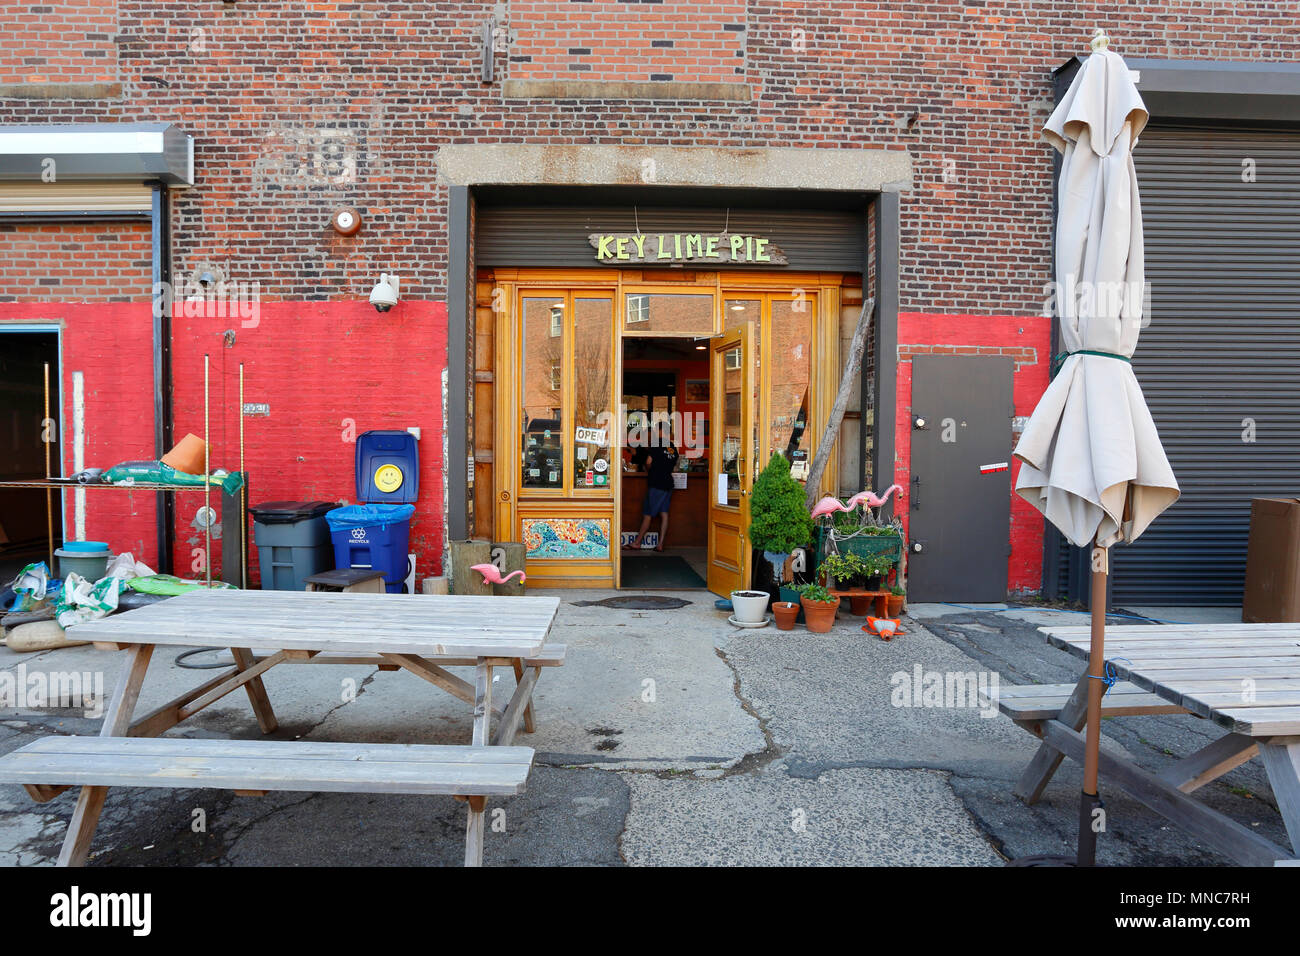 Steve's Key Lime Pie, 185 Van Dyke St, Brooklyn, NY - Stock Image